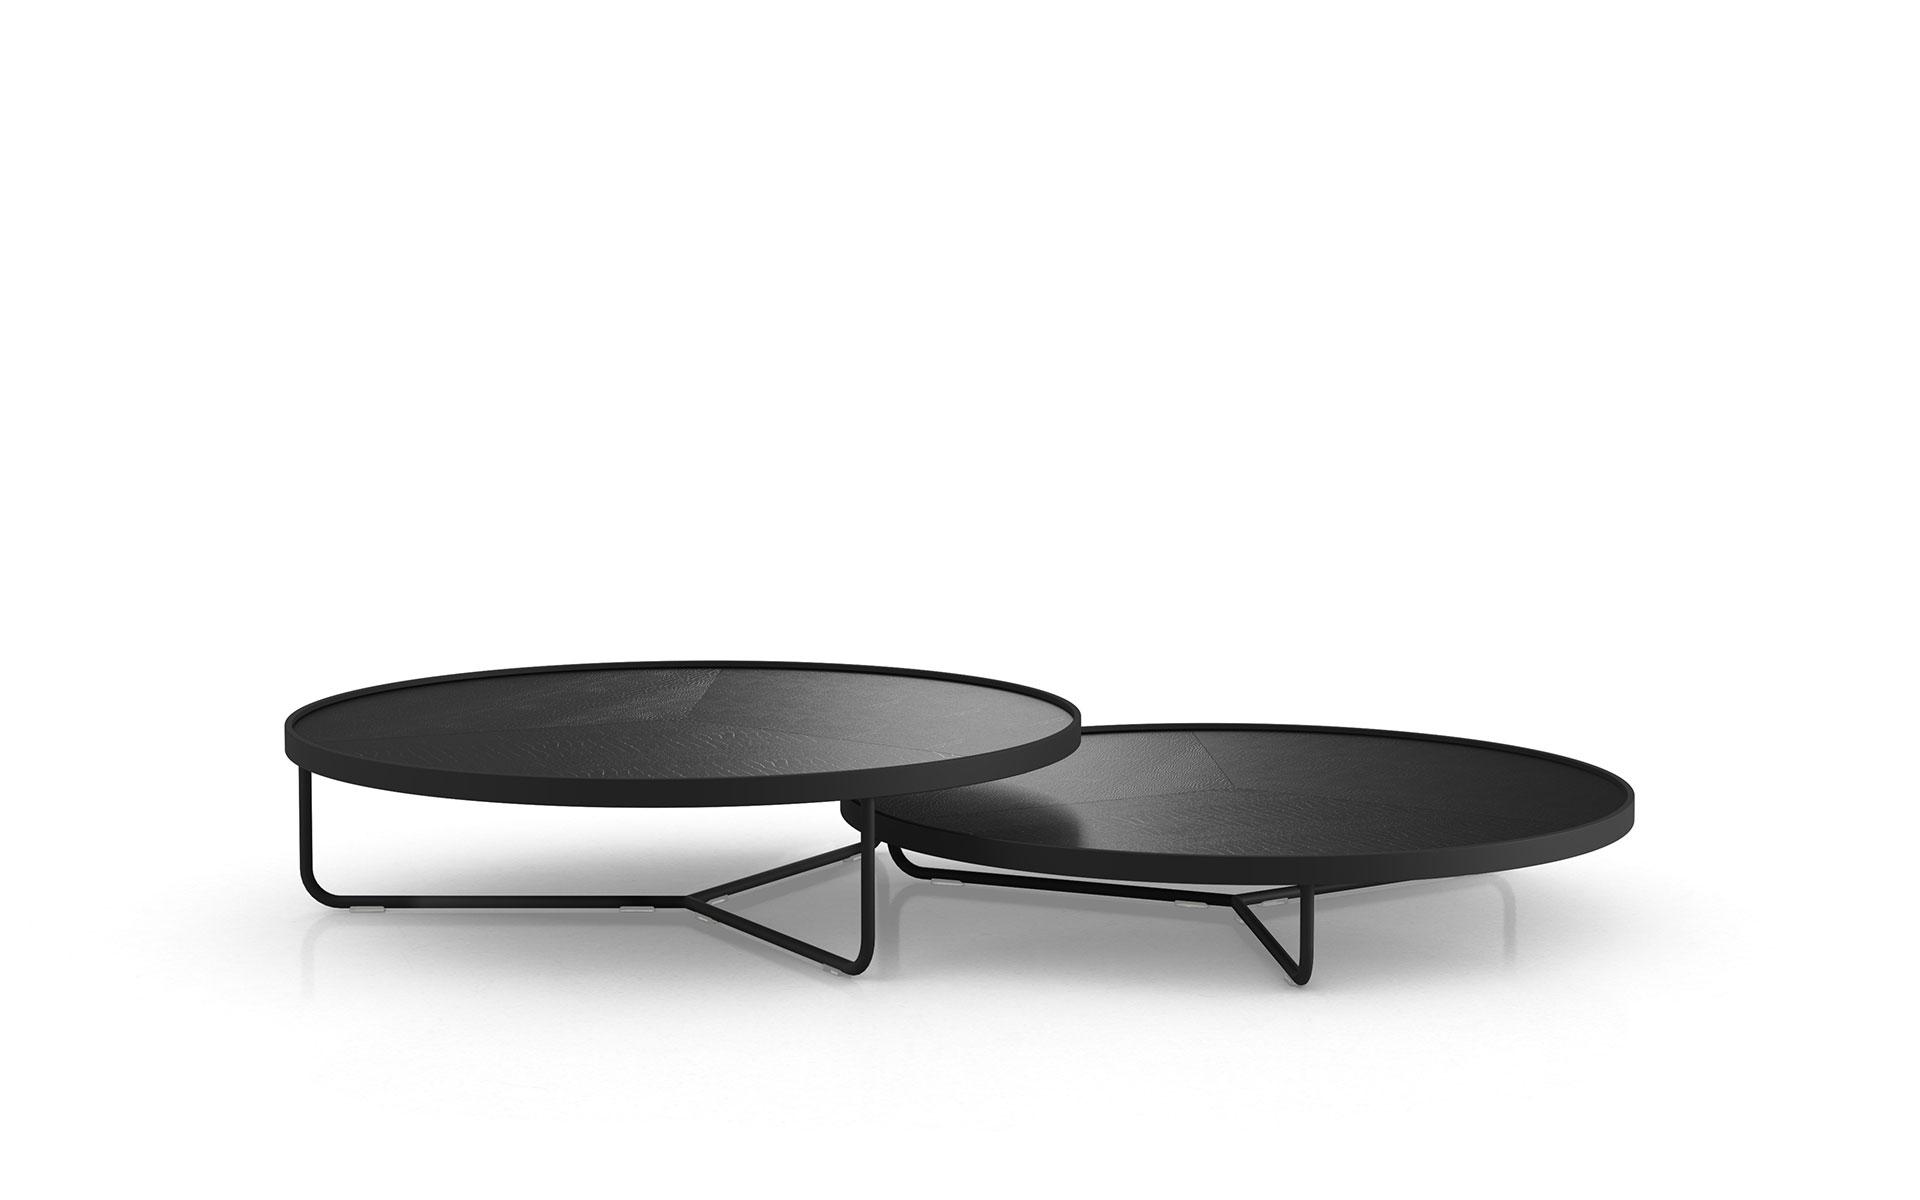 Modloft Adelphi Coffee Tables